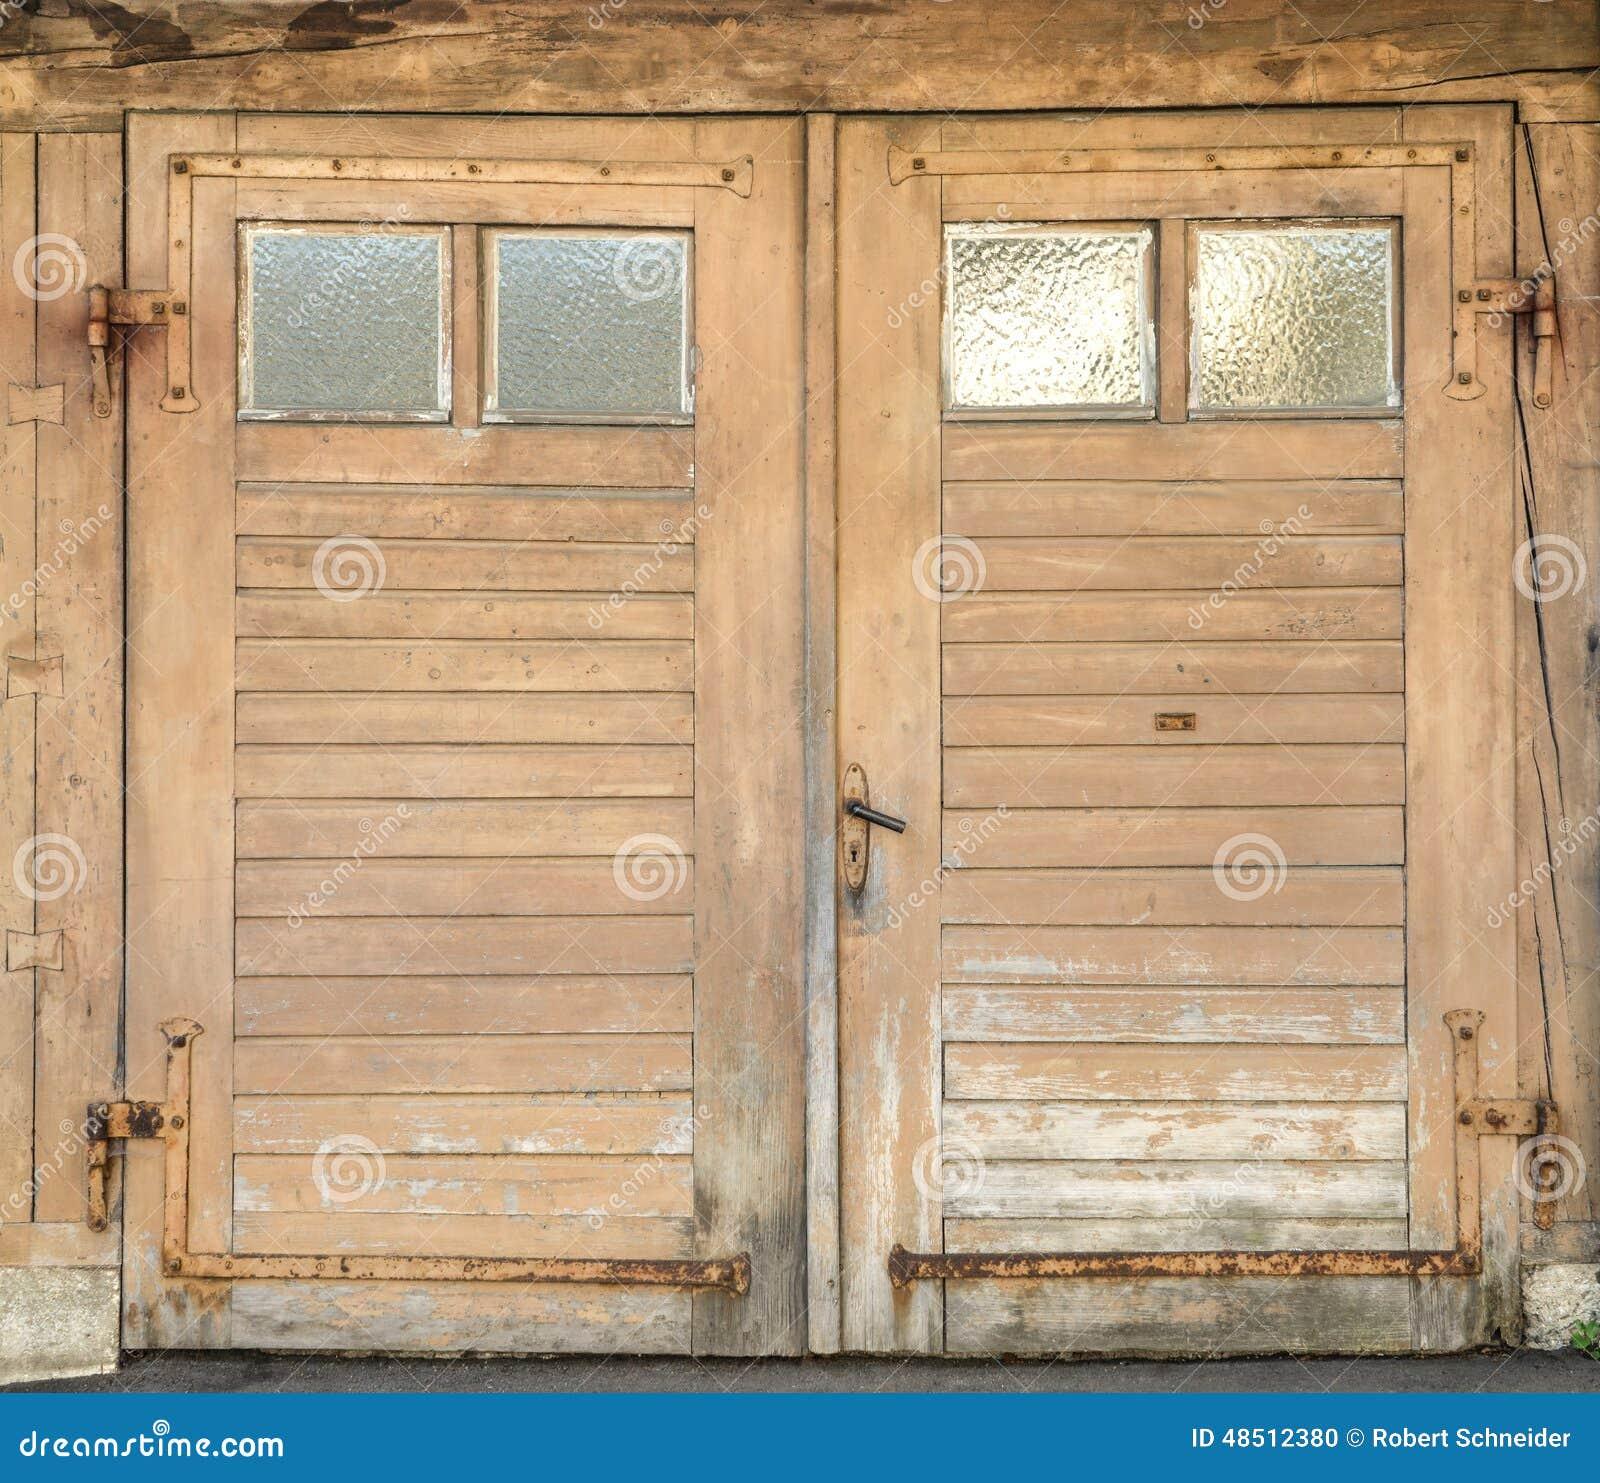 1222 #83A328 Old Garage Door With Four Small Windows Stock Photo Image 48512380  image Garage Doors Delaware 37431300